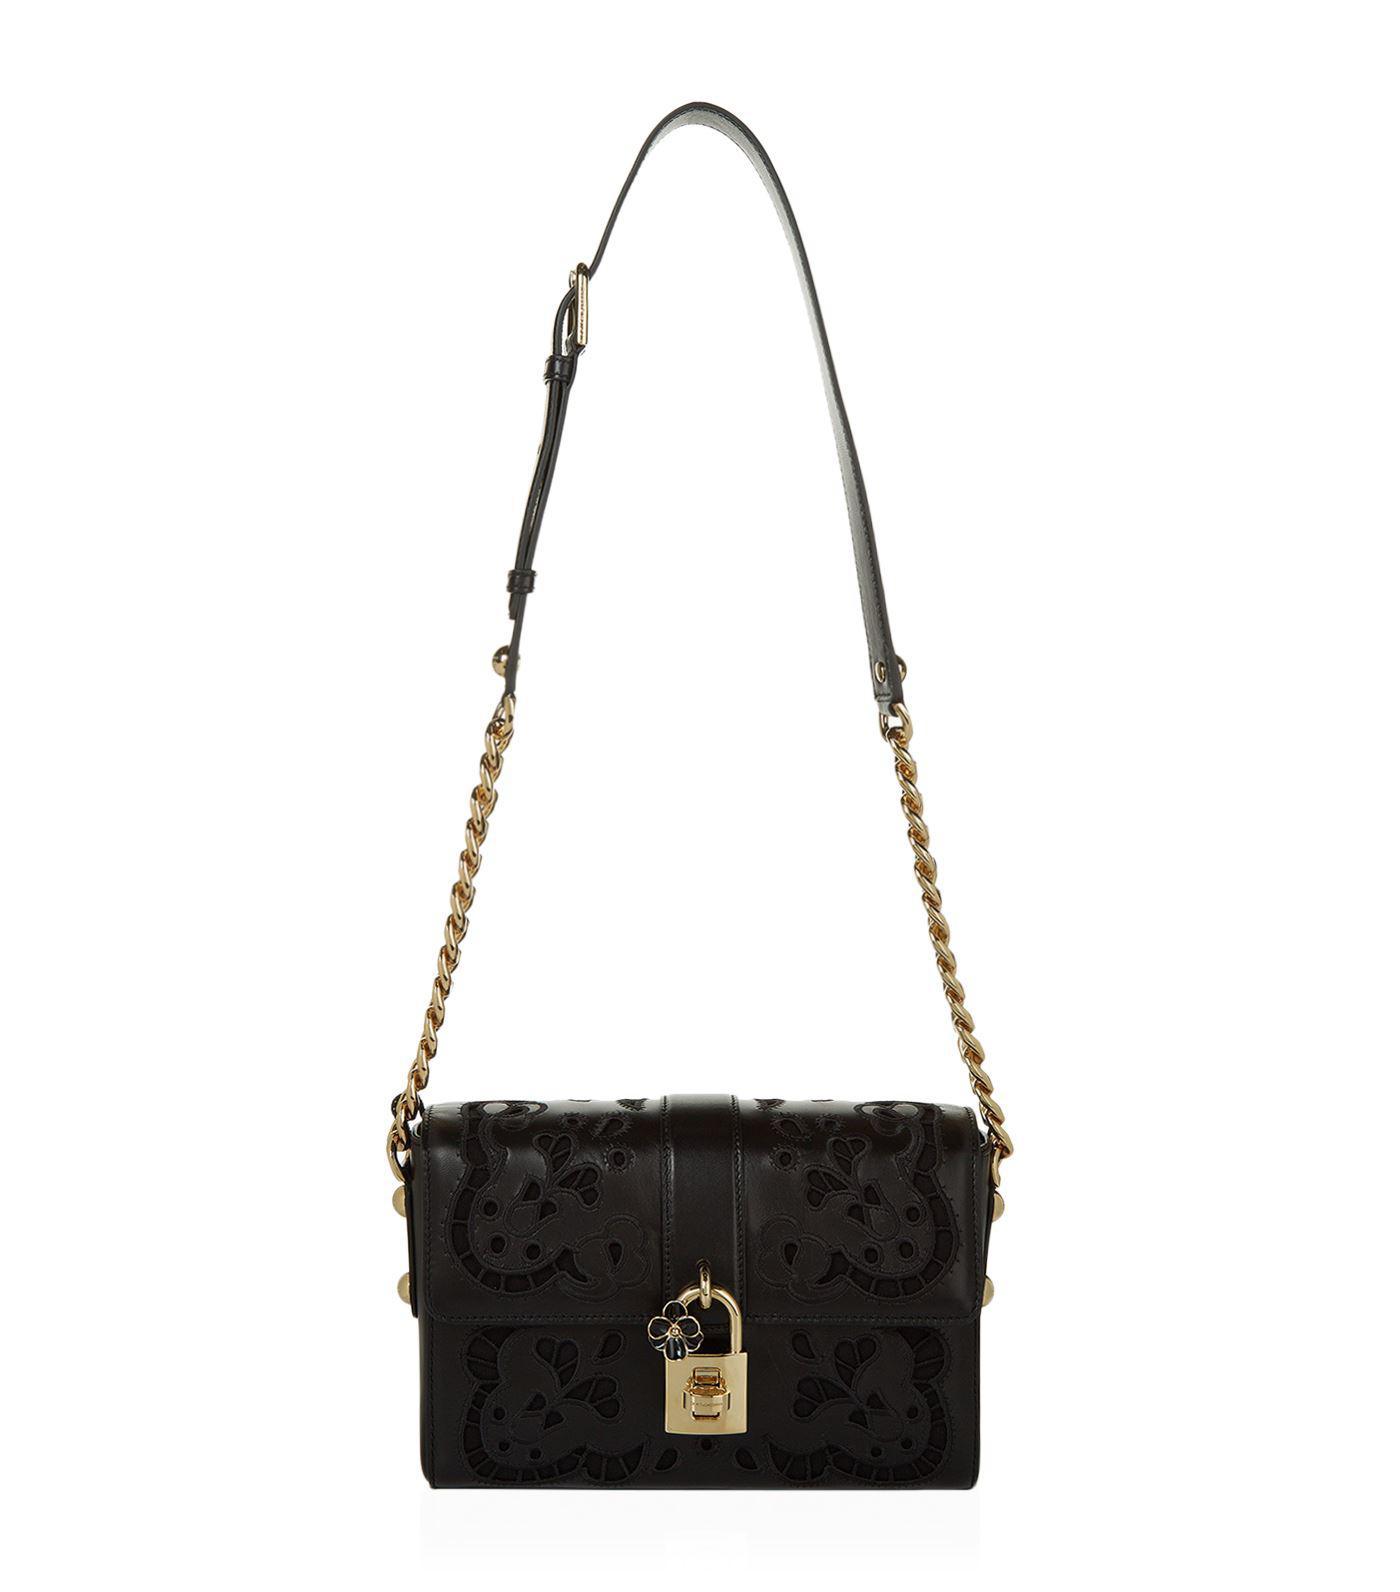 Heart padlock stud-embellished box bag Dolce & Gabbana 8c2m57iD5